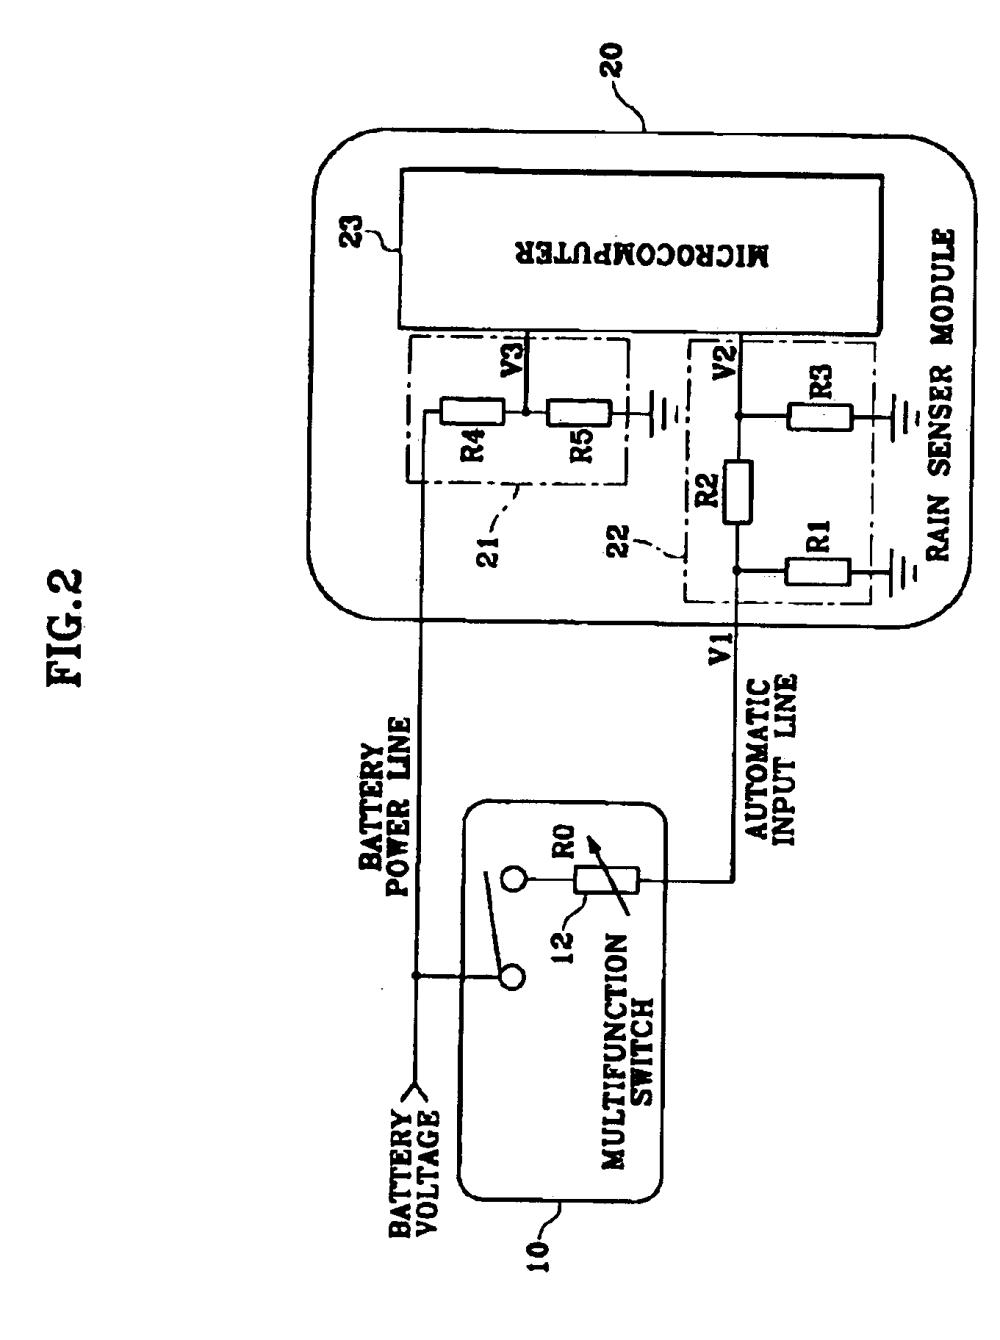 medium resolution of valeo wiper motor wiring diagram wiring diagramwrg 7792 hq holden wiper motor wiring diagramawesome valeo